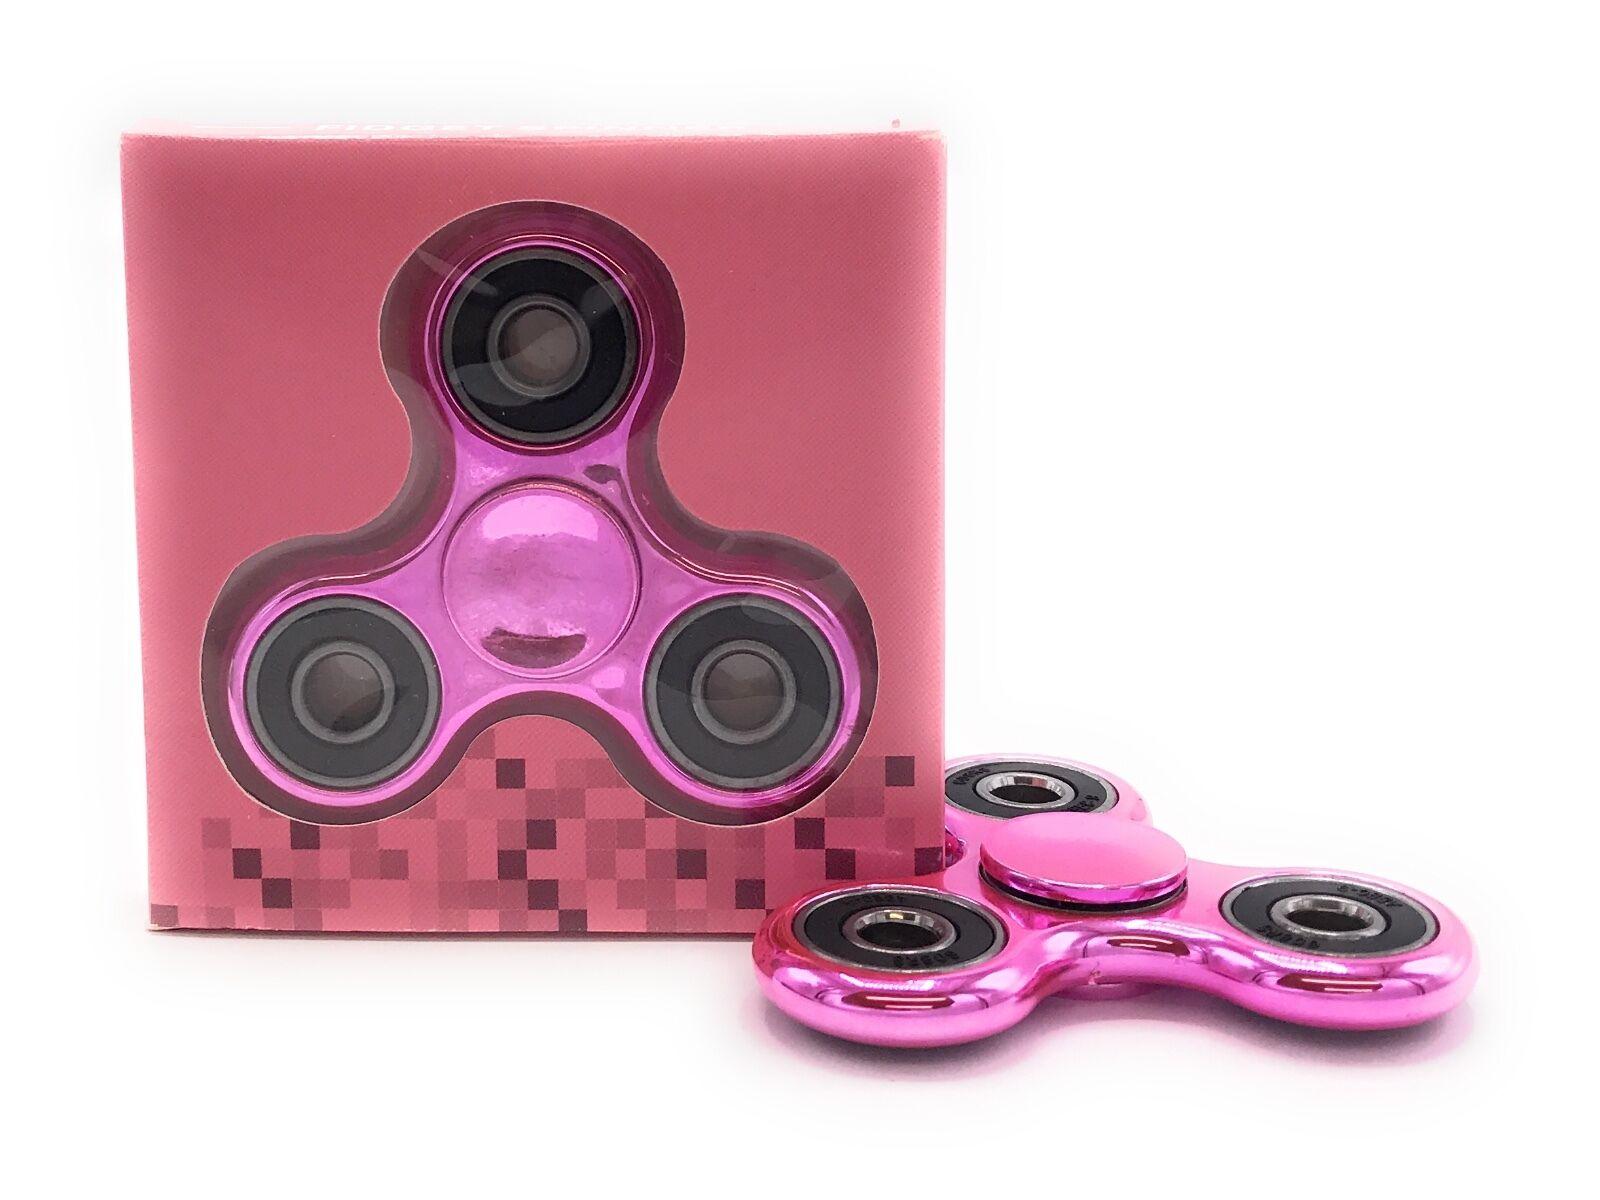 Bangers Spinner doigt main Focus SPIN ACIER EDC anti stress jouets UK Rose Rainbow